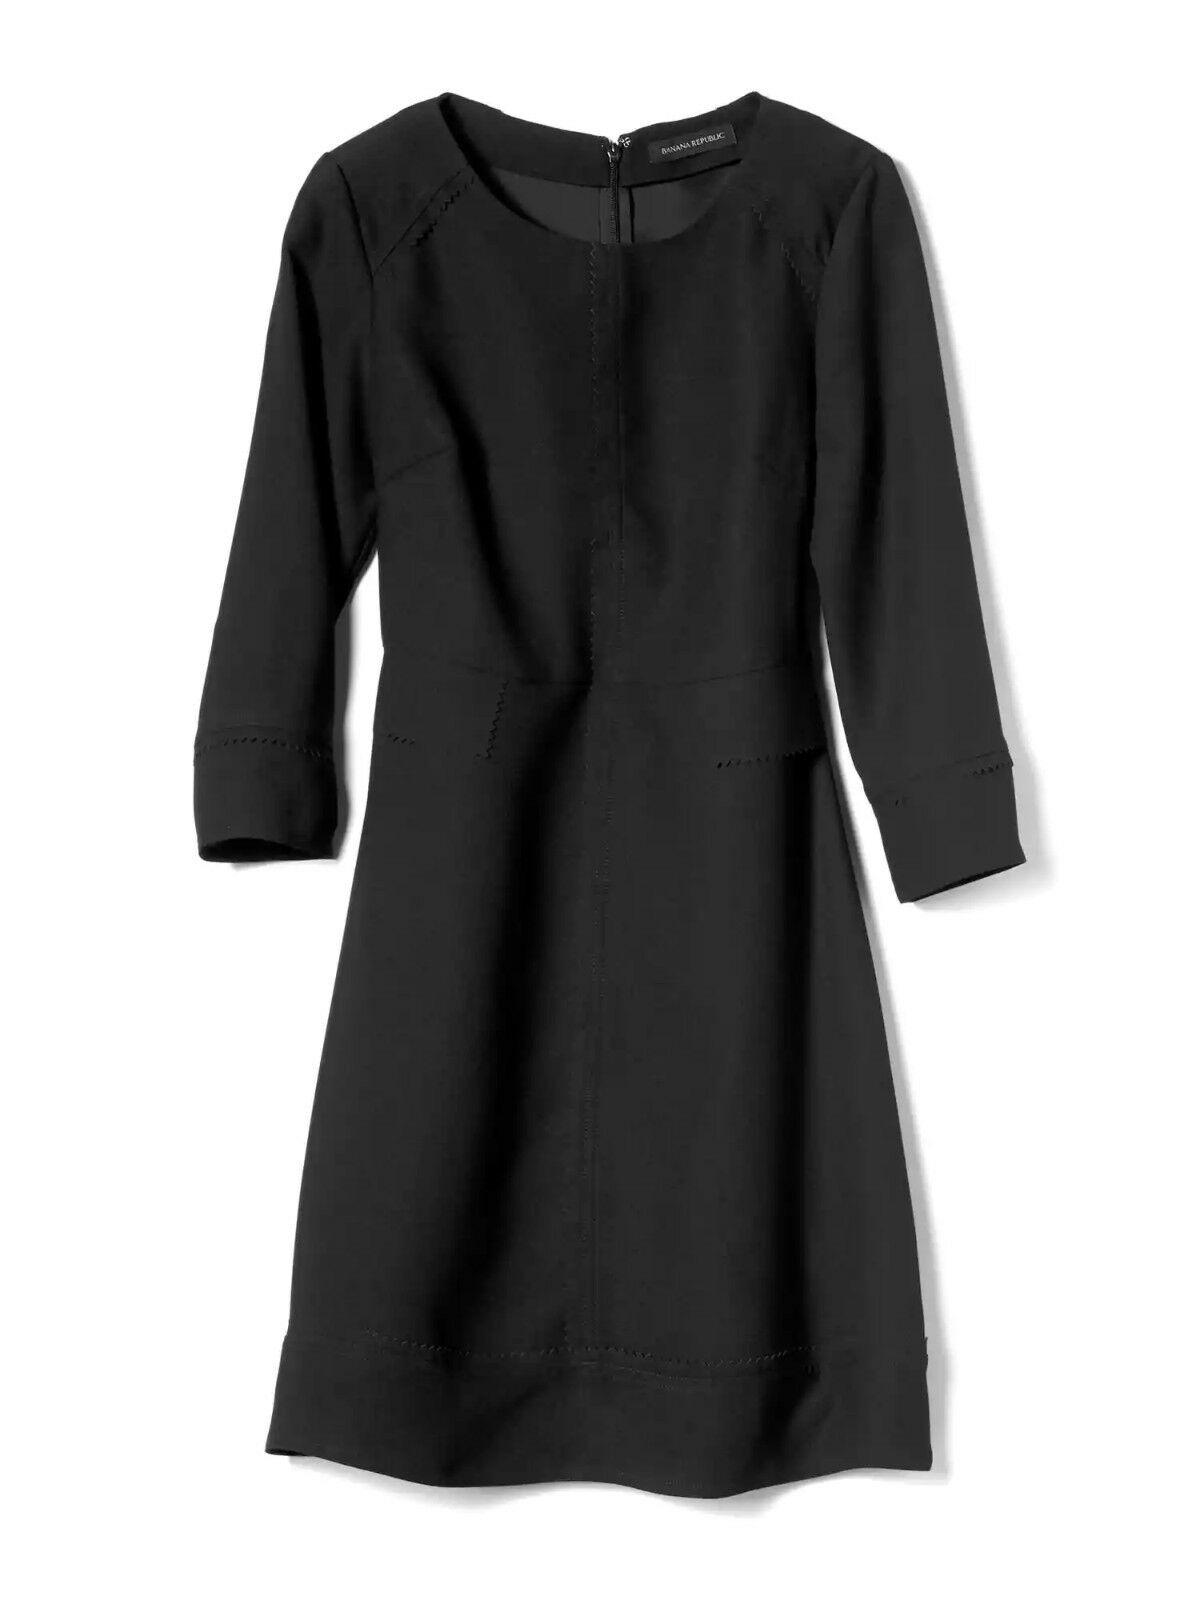 NWT Banana Republic Laser Cut Detailed Dress, schwarz Größe 12   v